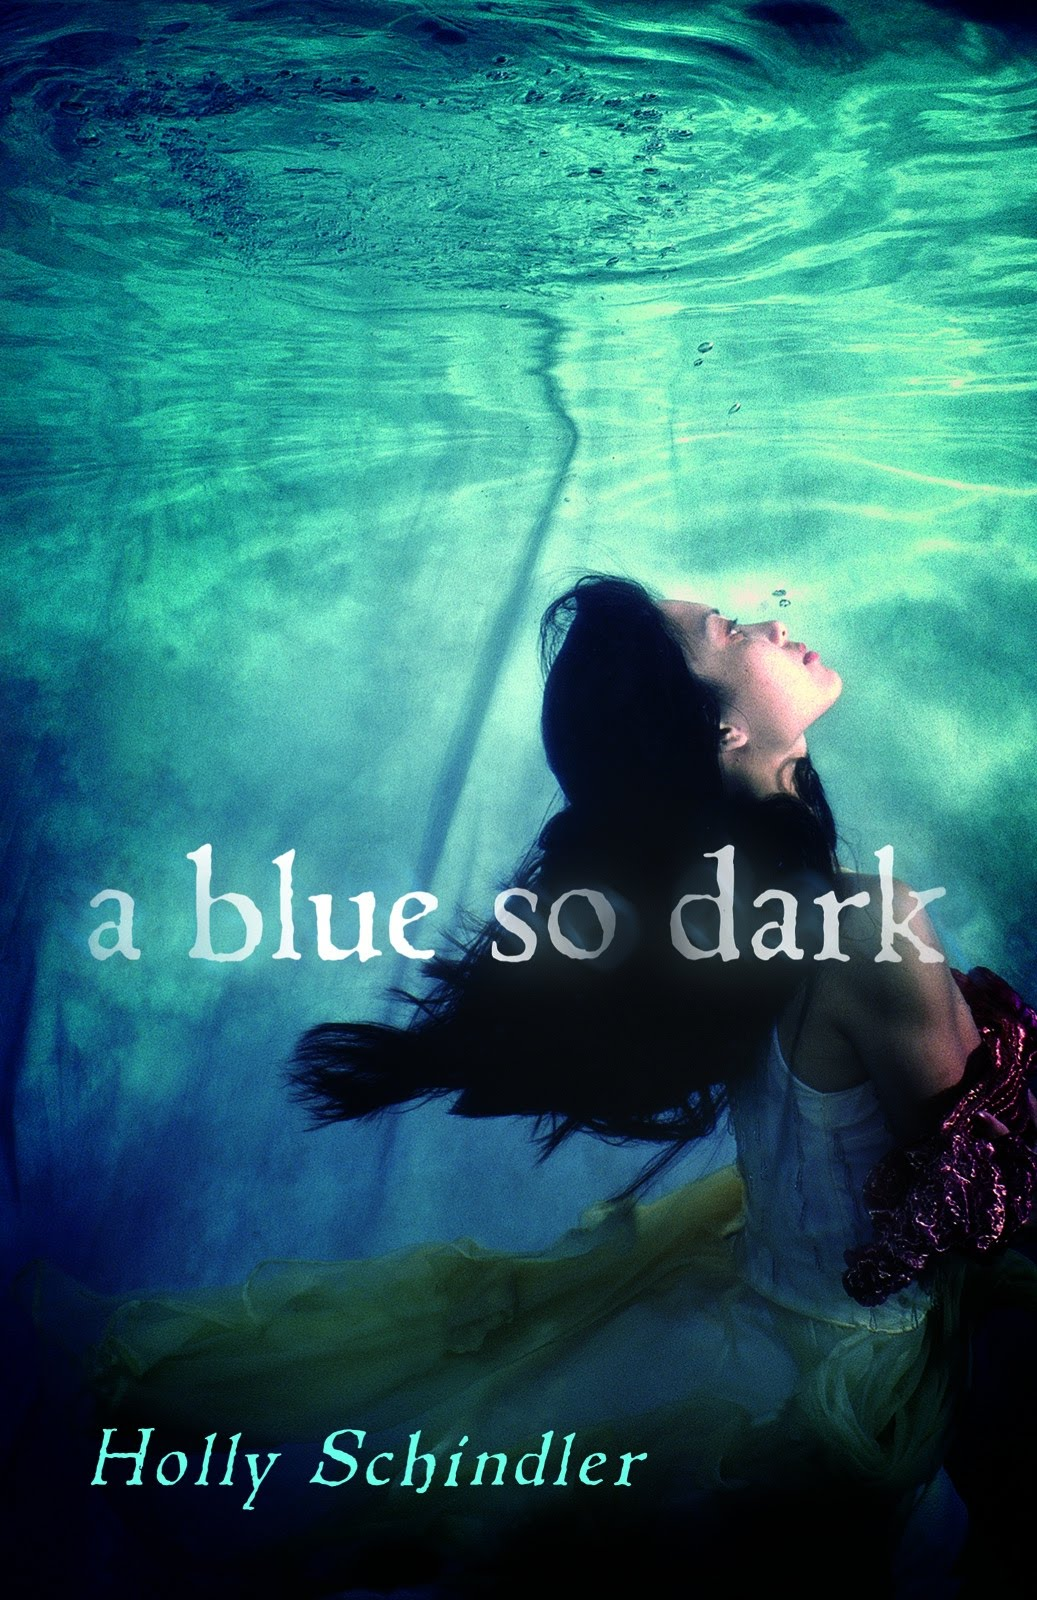 A Blue So Dark Holly Schindler